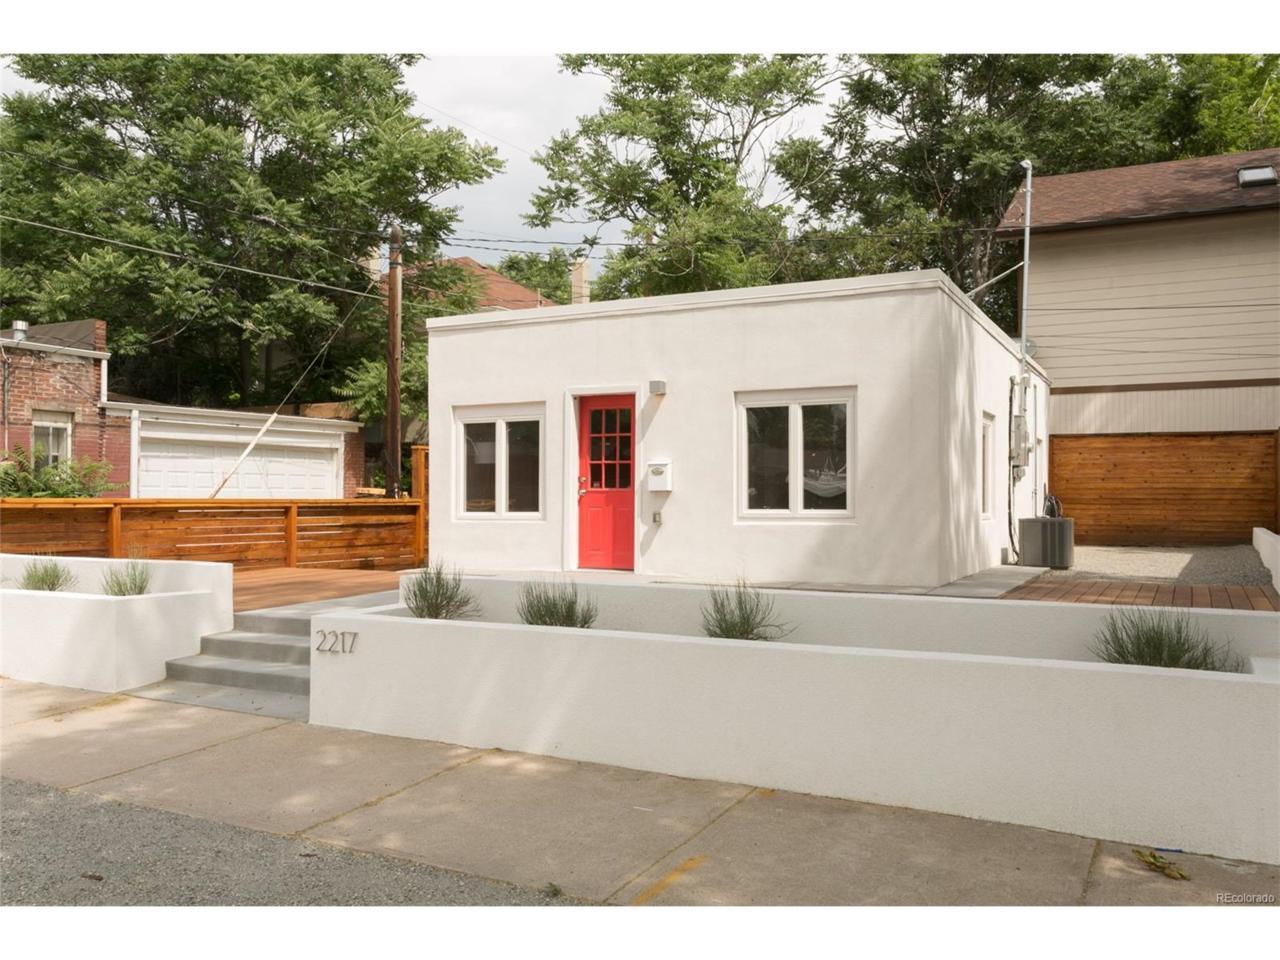 2217 W 44th Avenue, Denver, CO 80211 (MLS #8087685) :: 8z Real Estate